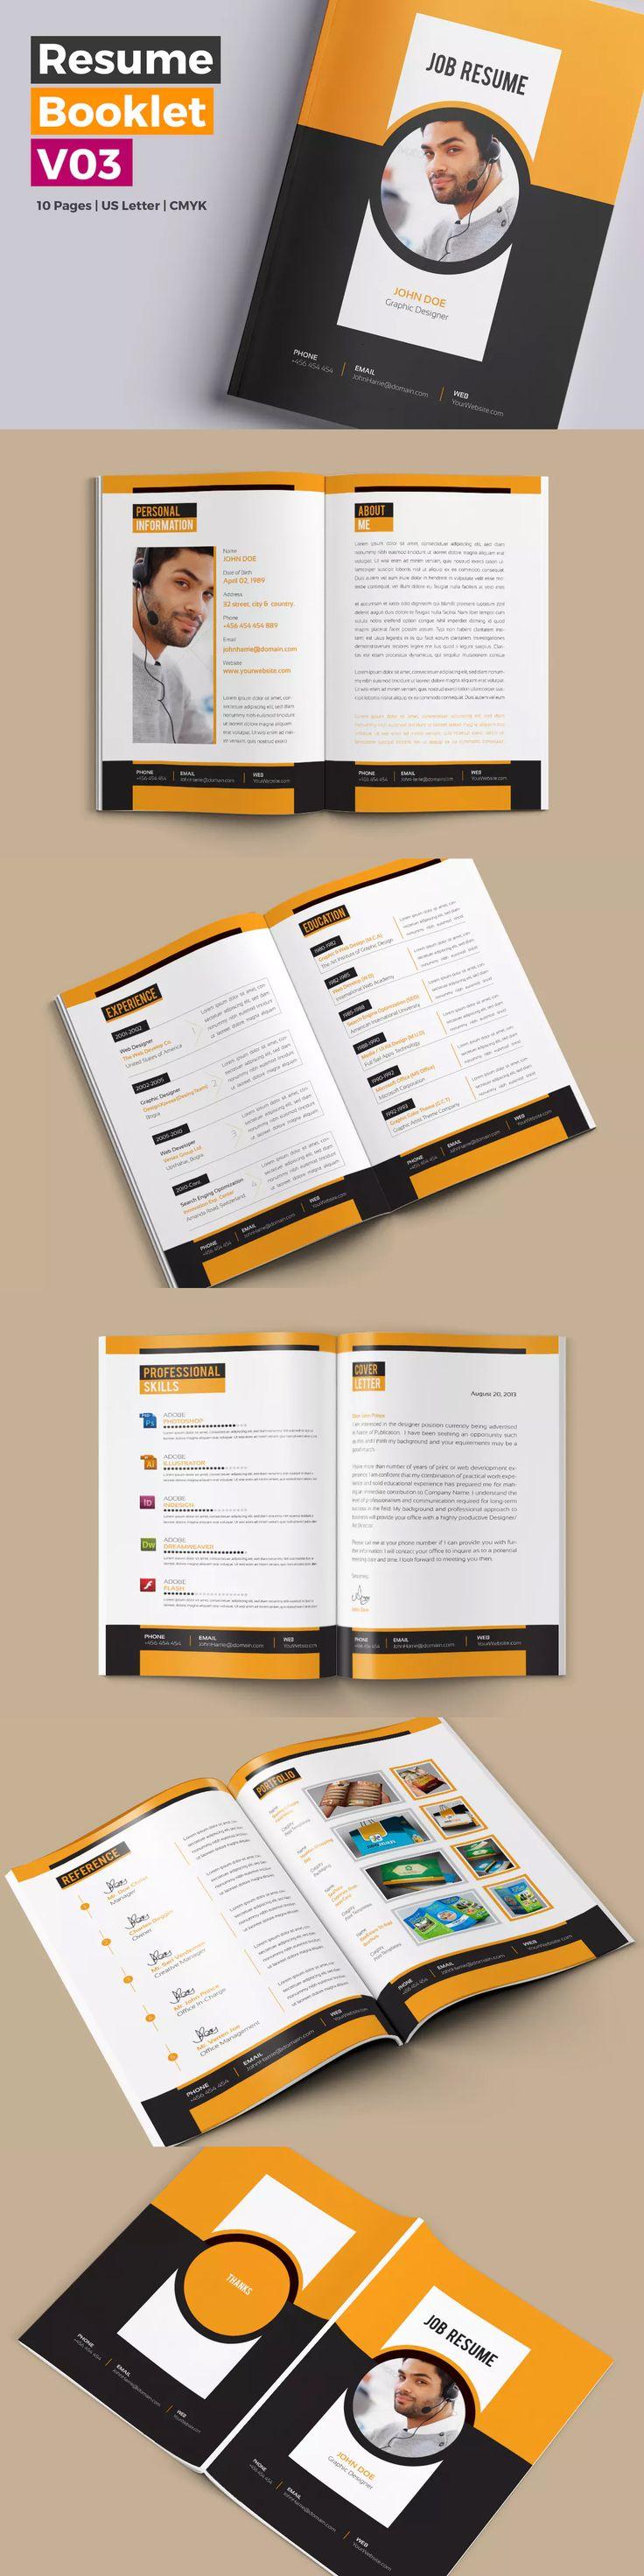 89 best Resume / CV Design Templates images on Pinterest ...